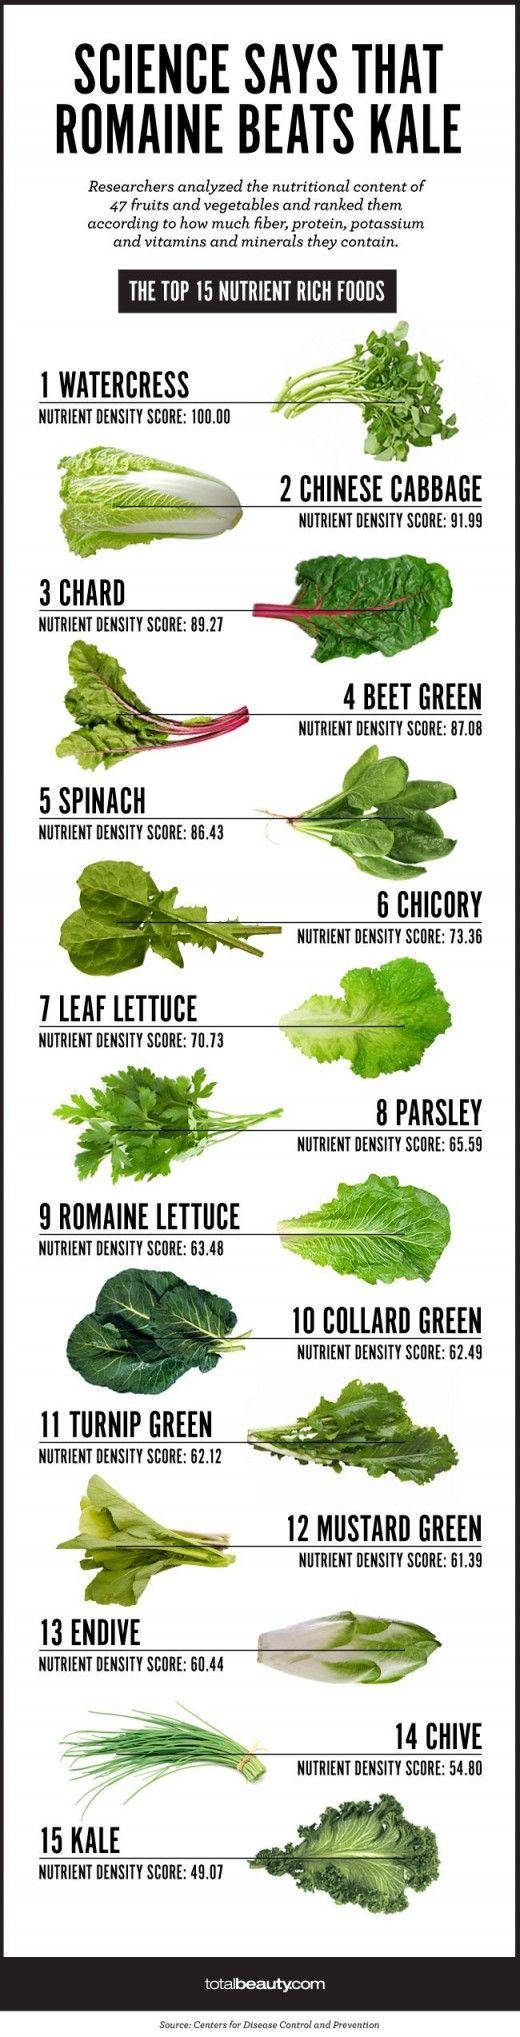 Romaine Beats Kale – Science Says